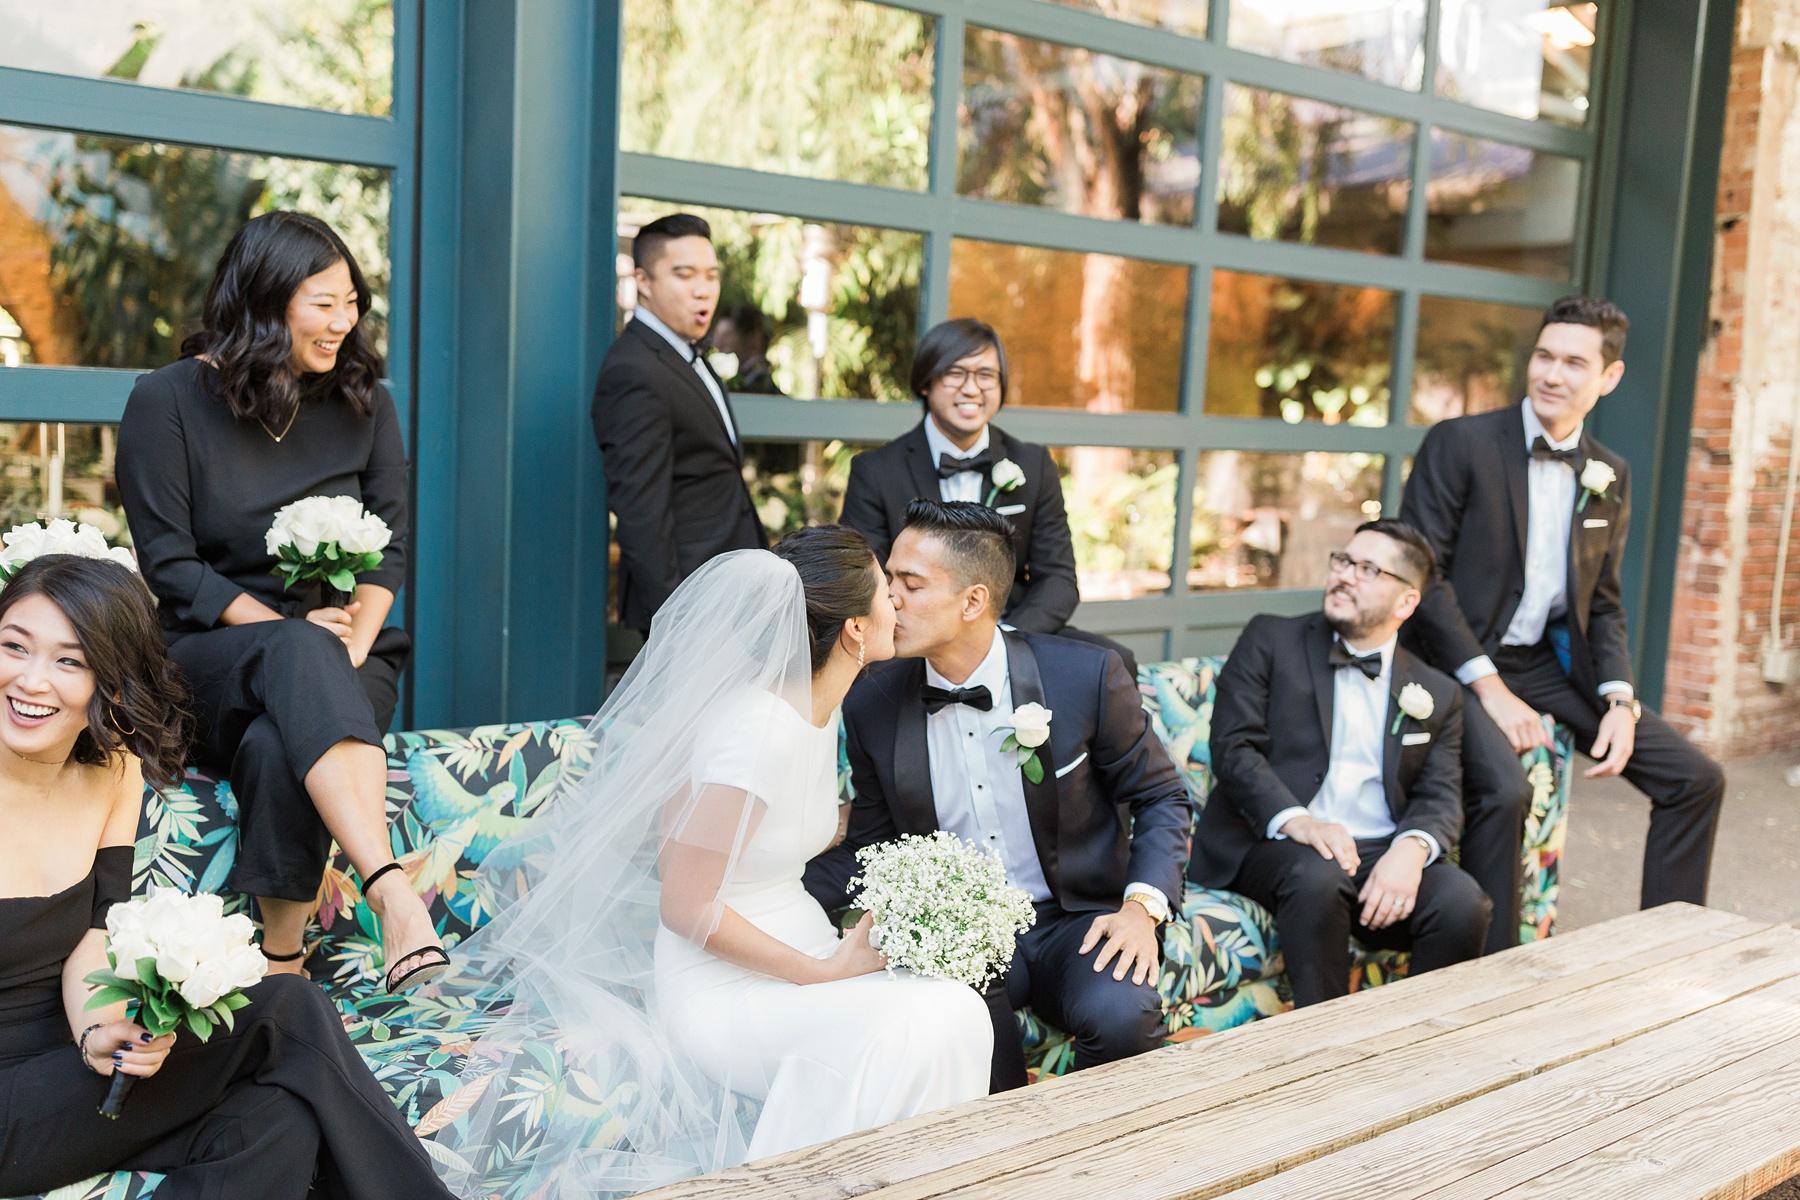 Urban DTLA Wedding at Millwick By Wedding Photographer Madison Ellis (20)